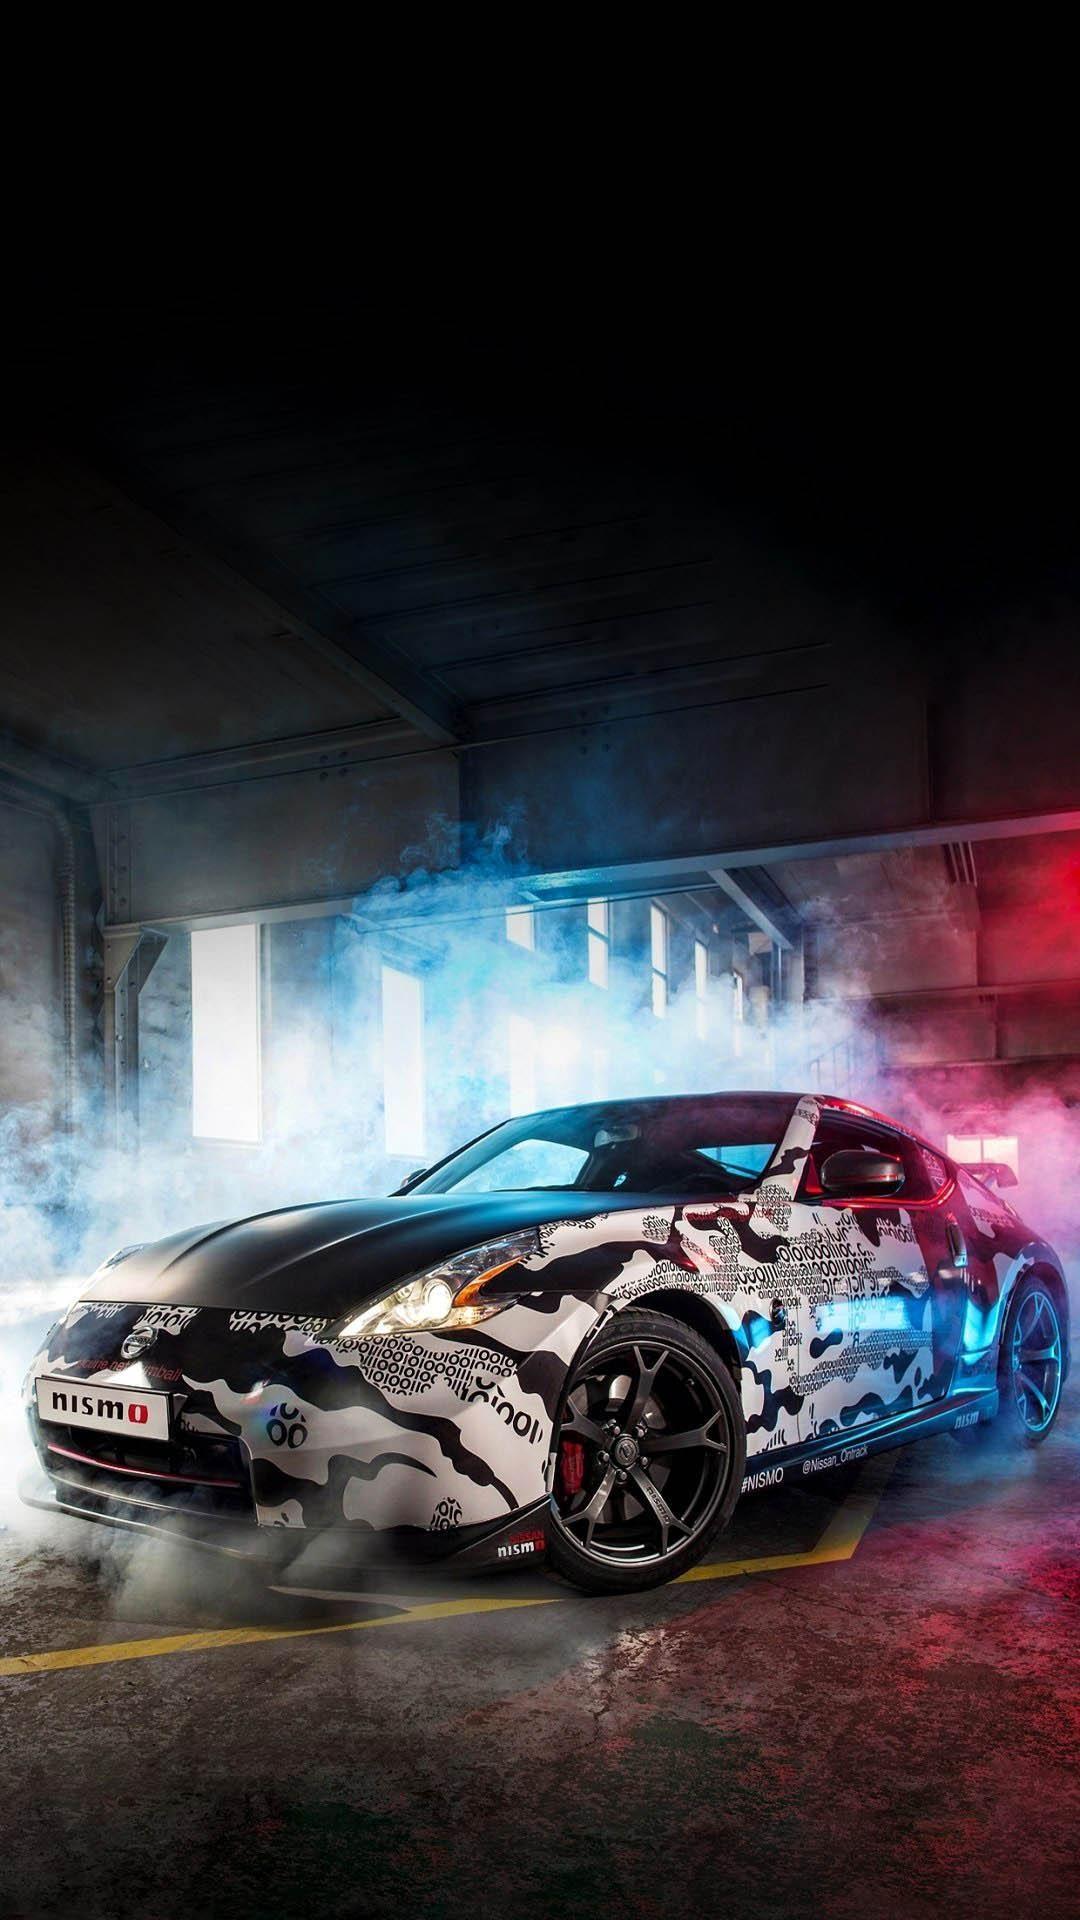 Ferrari cars | wallpapers in hd. Jdm Car Wallpaper For Pc